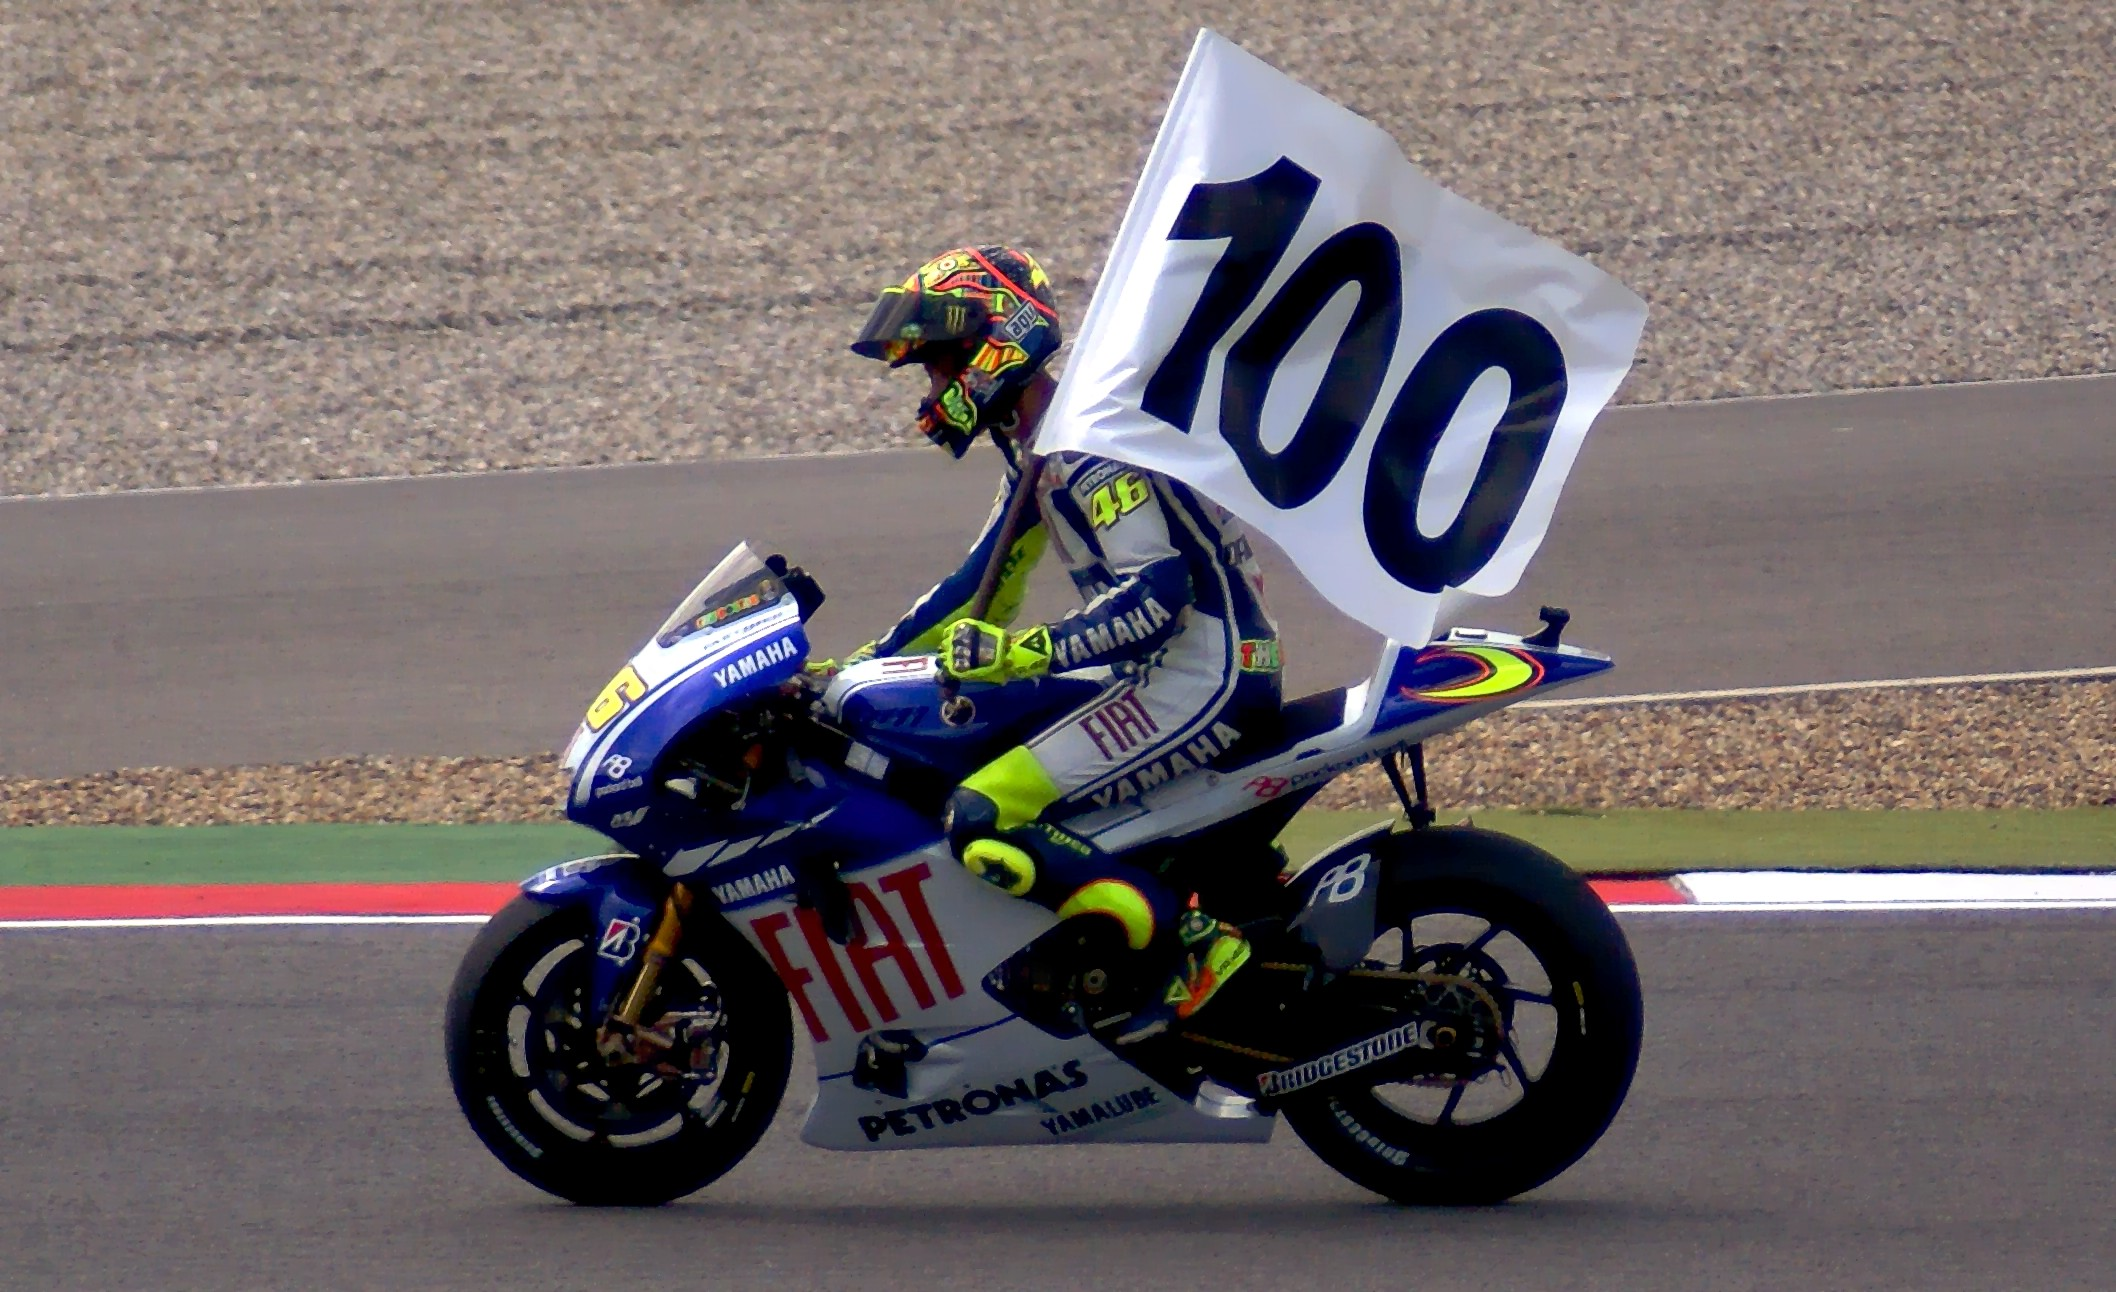 File:Valentino Rossi vittoria 100.jpg - Wikimedia Commons